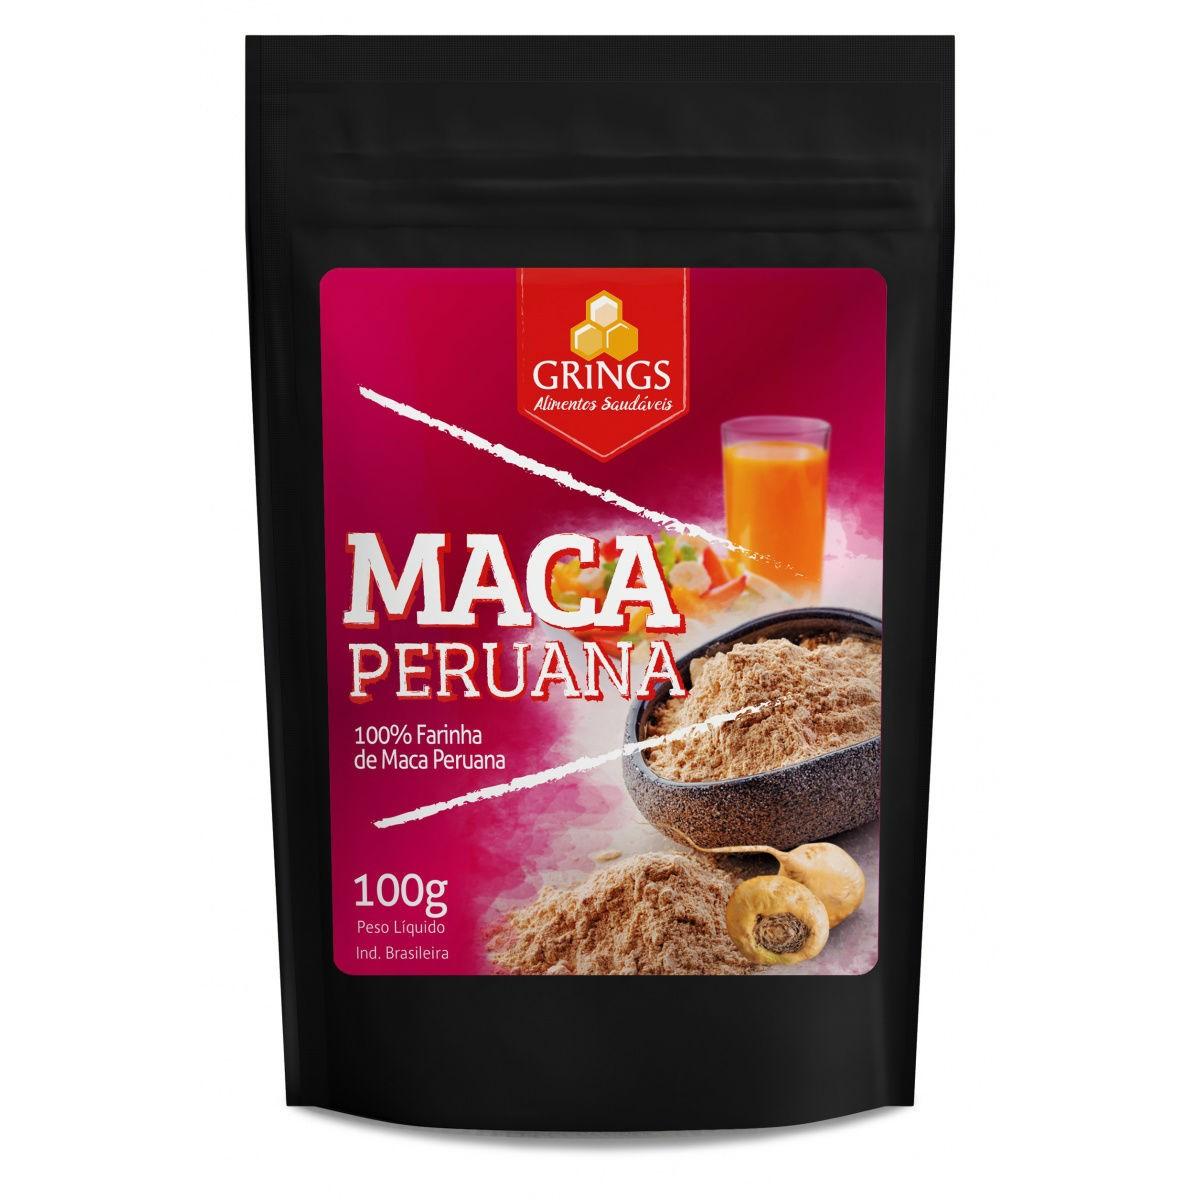 Farinha de Maca Peruana 100g - Grings